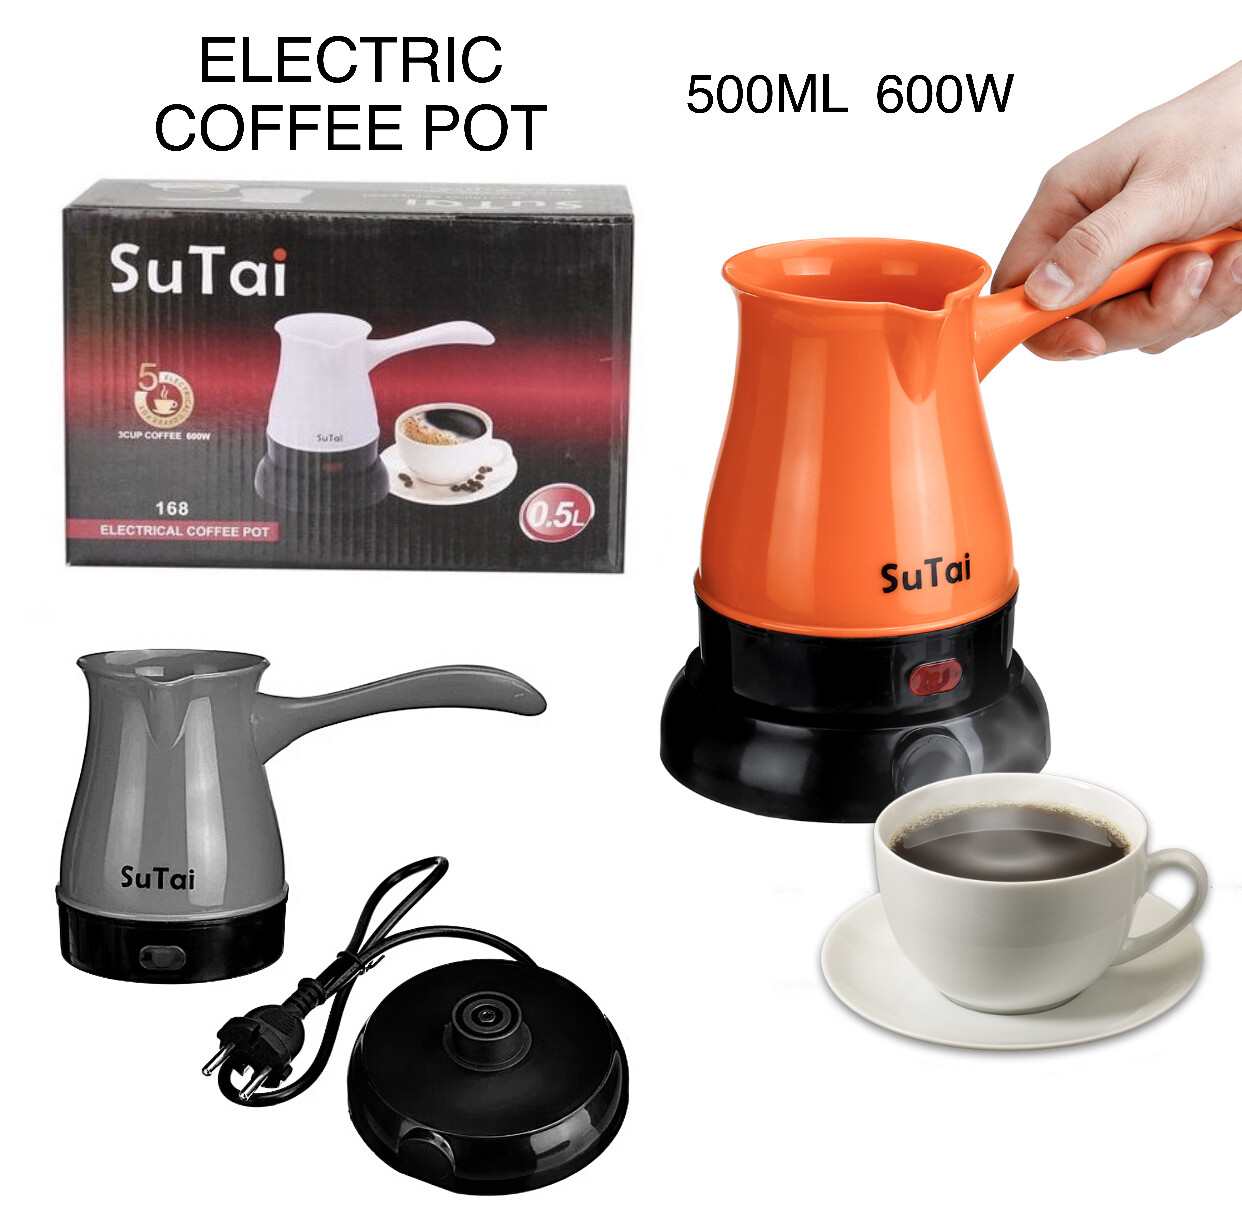 SuTai Electric Coffee Pot